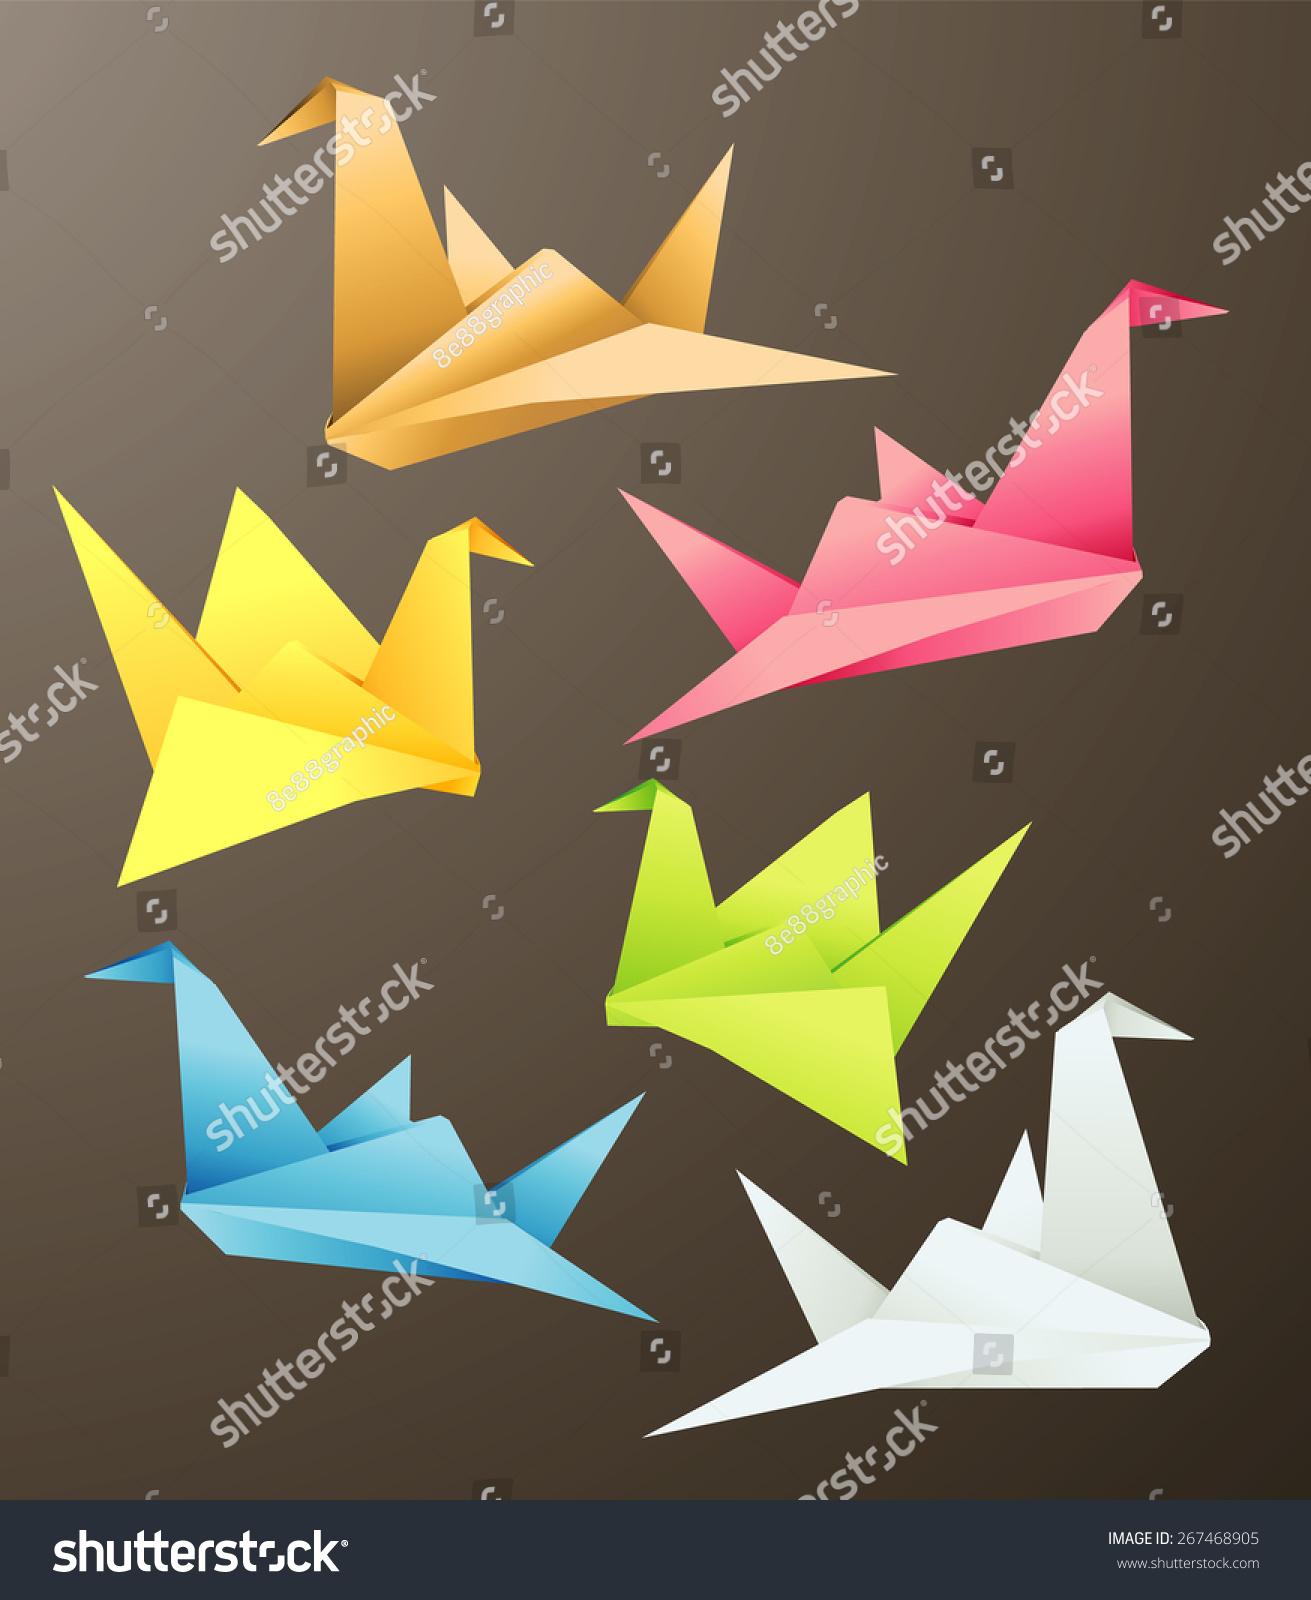 Bird origami objects vector illustration stock vector 267468905 bird origami objects vector illustration jeuxipadfo Choice Image